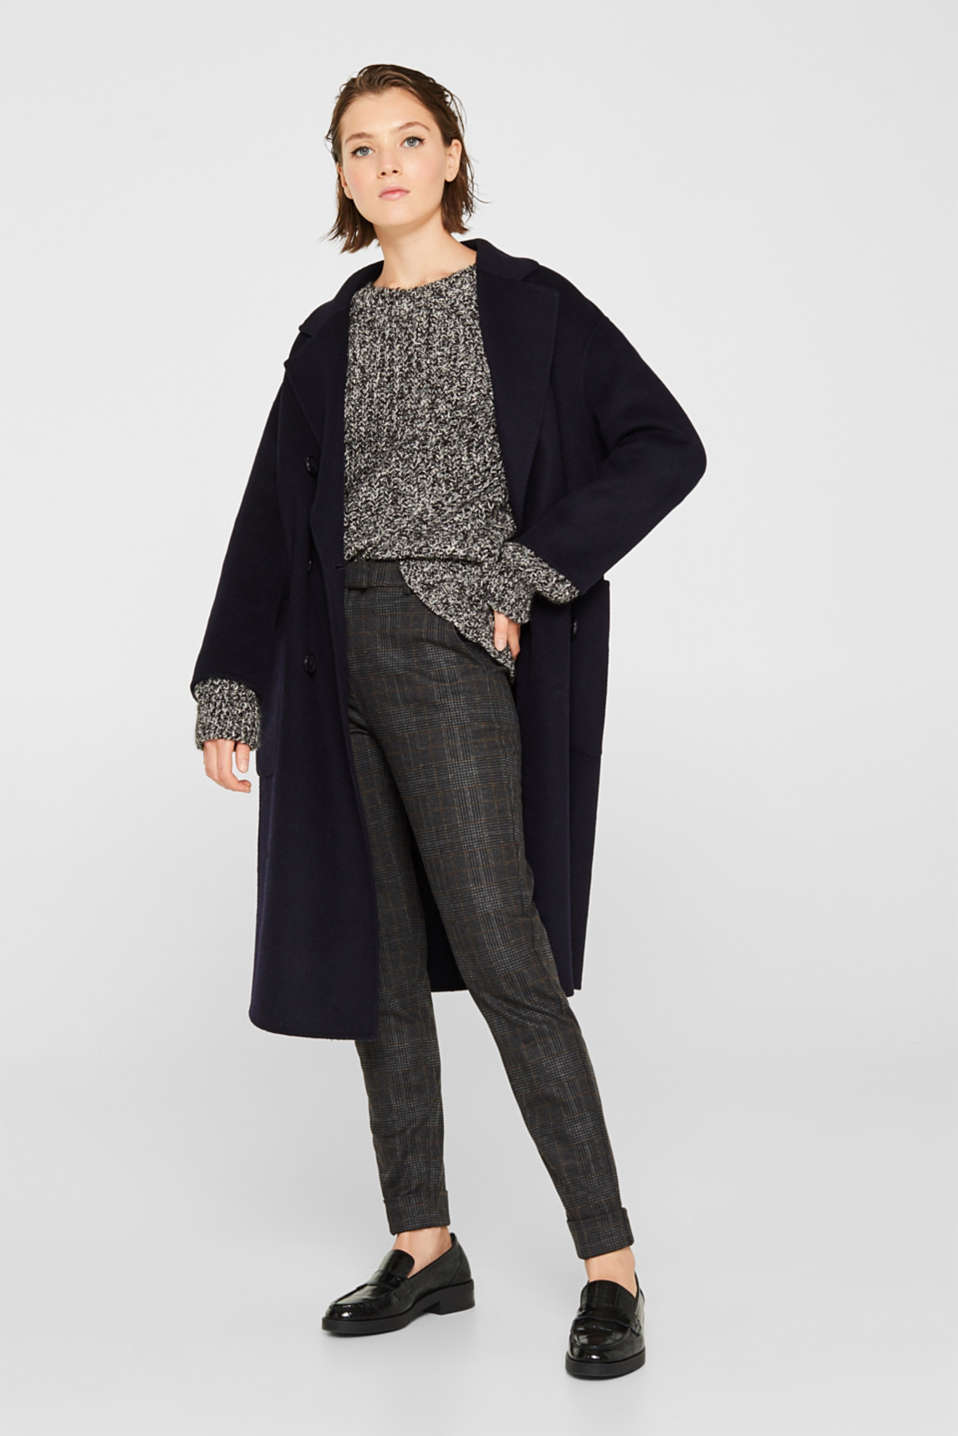 With wool: mouliné jumper, GUNMETAL 4, detail image number 1